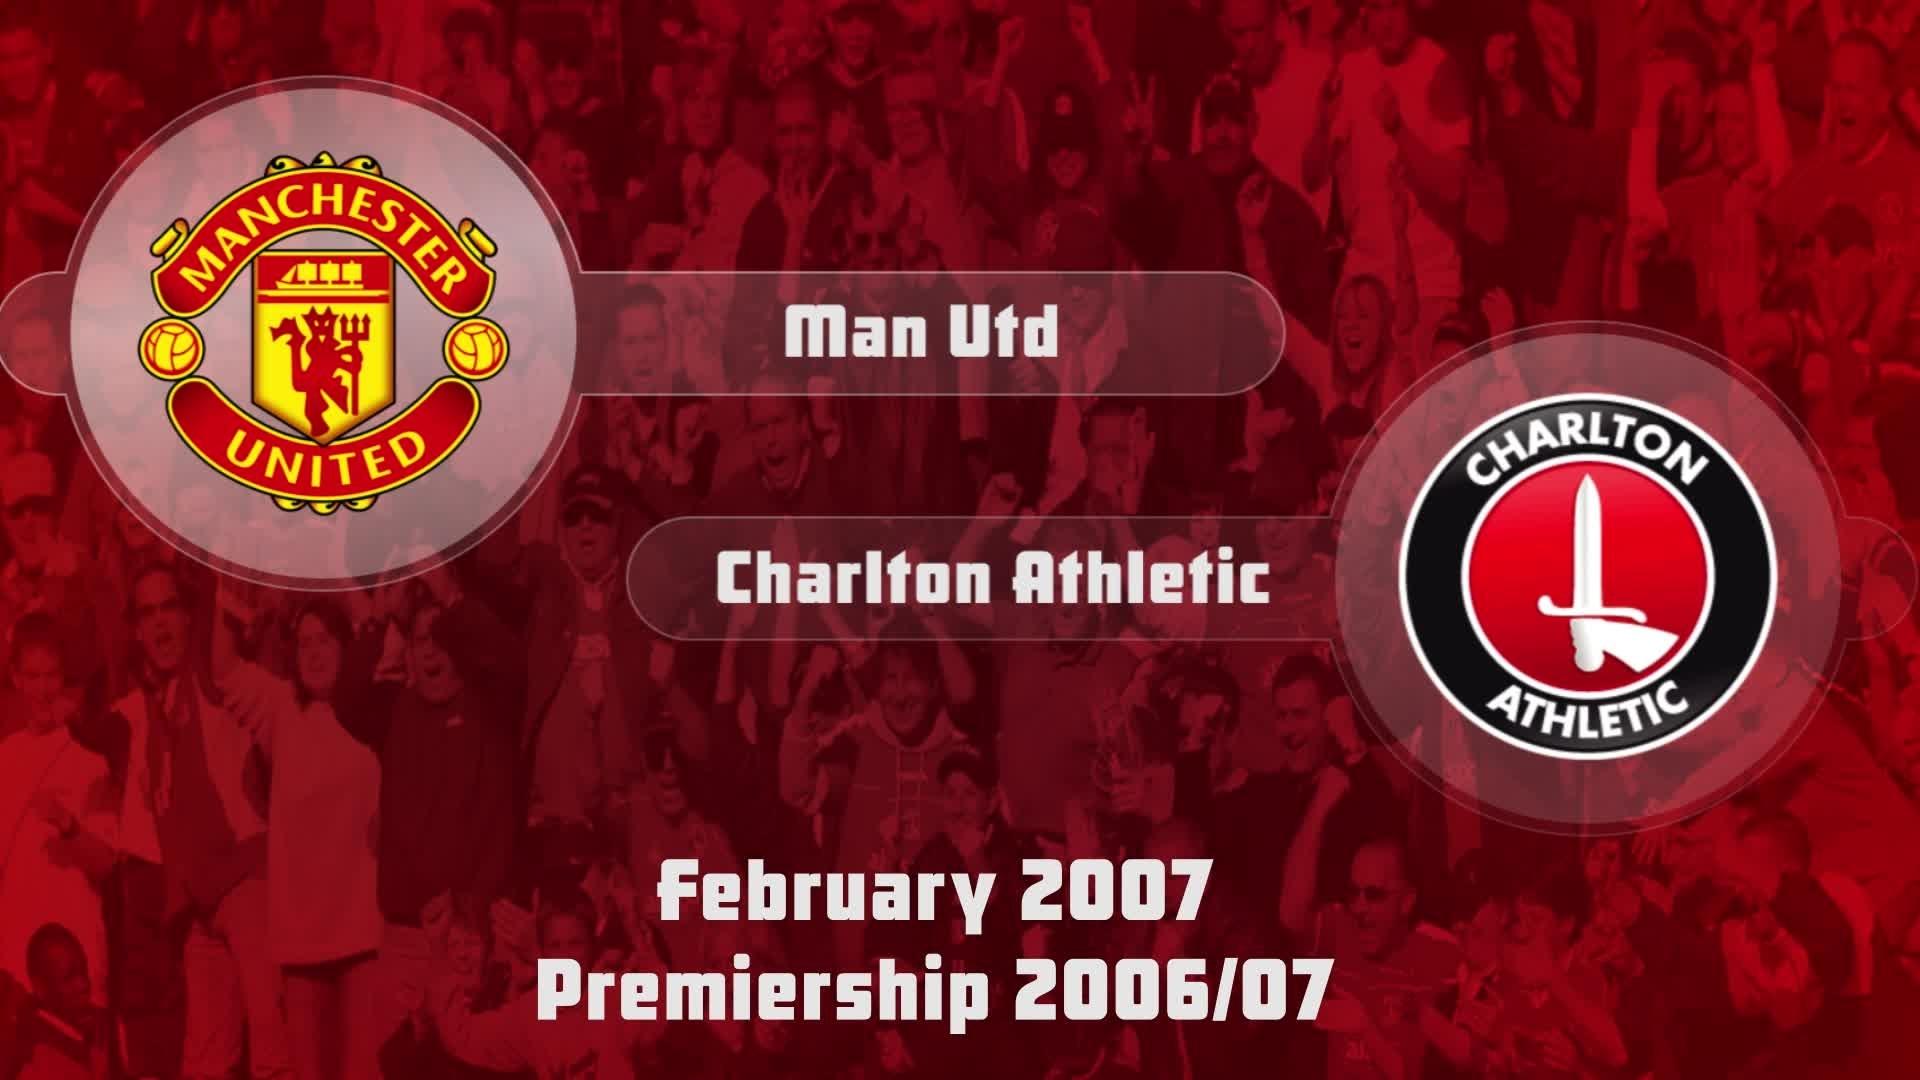 32 HIGHLIGHTS | Man Utd 2 Charlton 0 (Feb 2007)